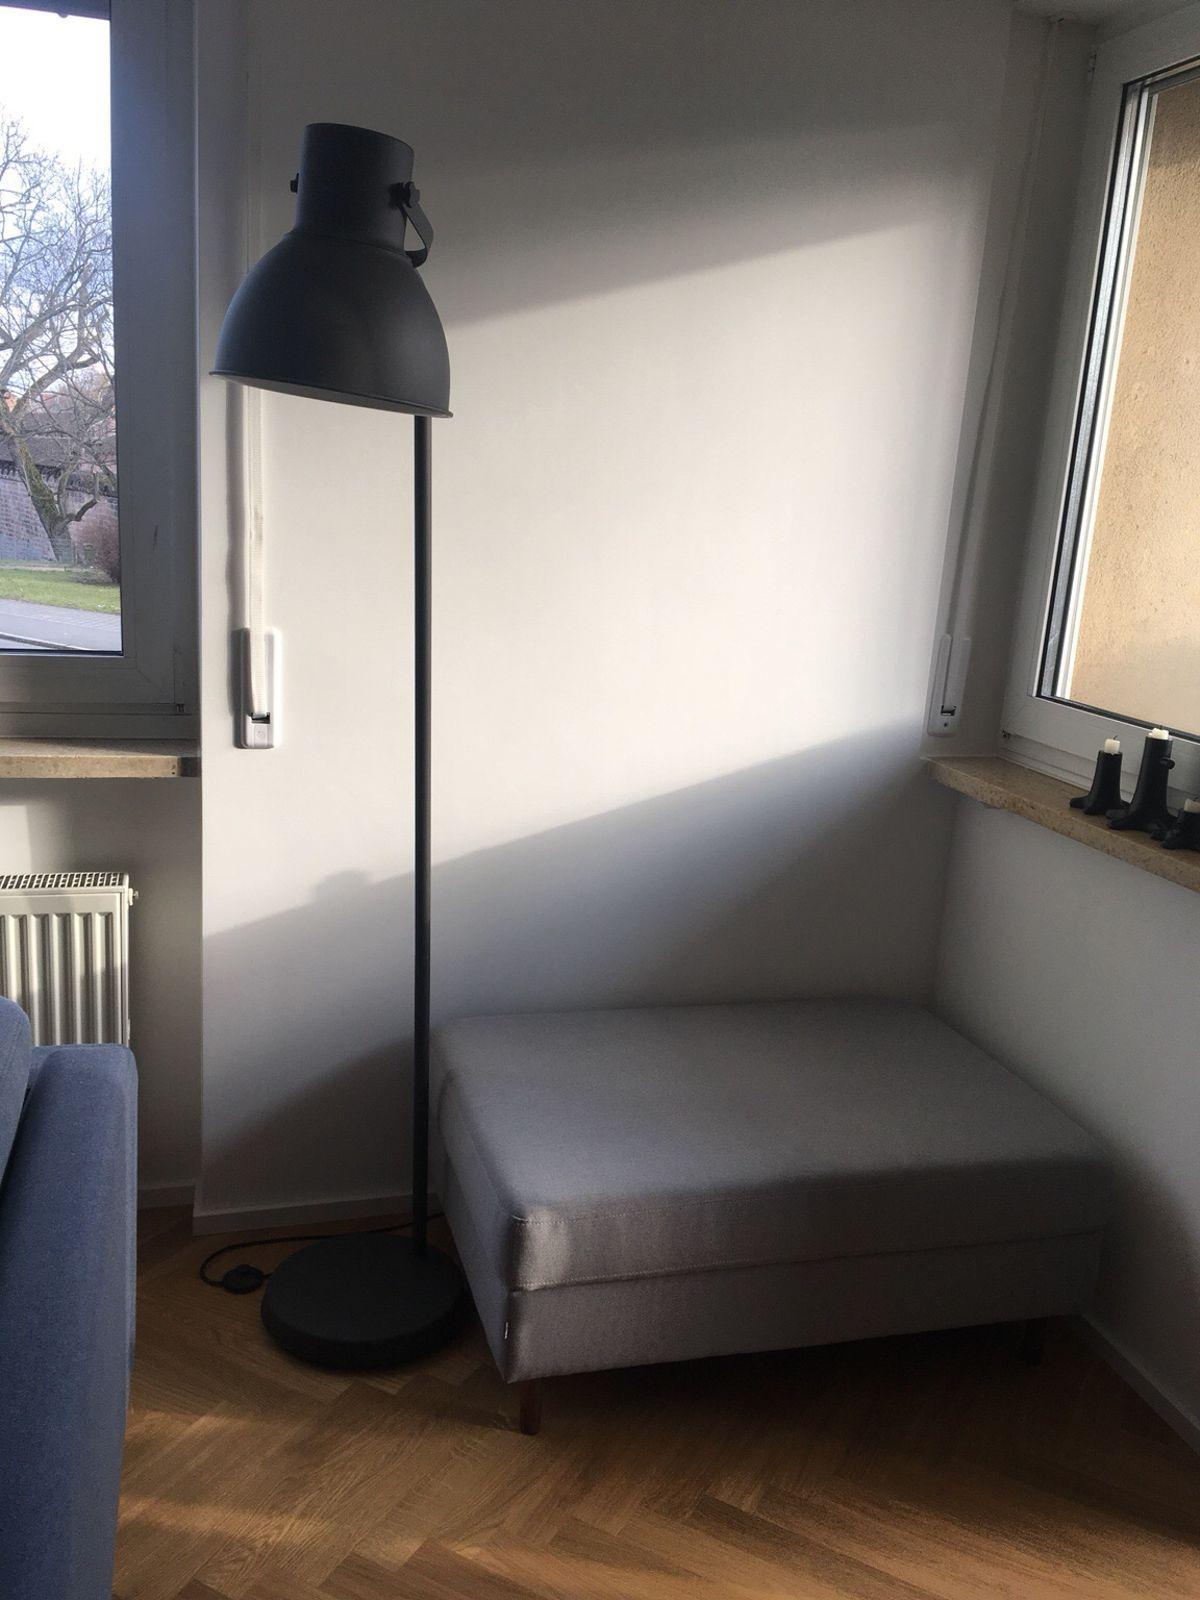 Hektar Ikea Stehlampe